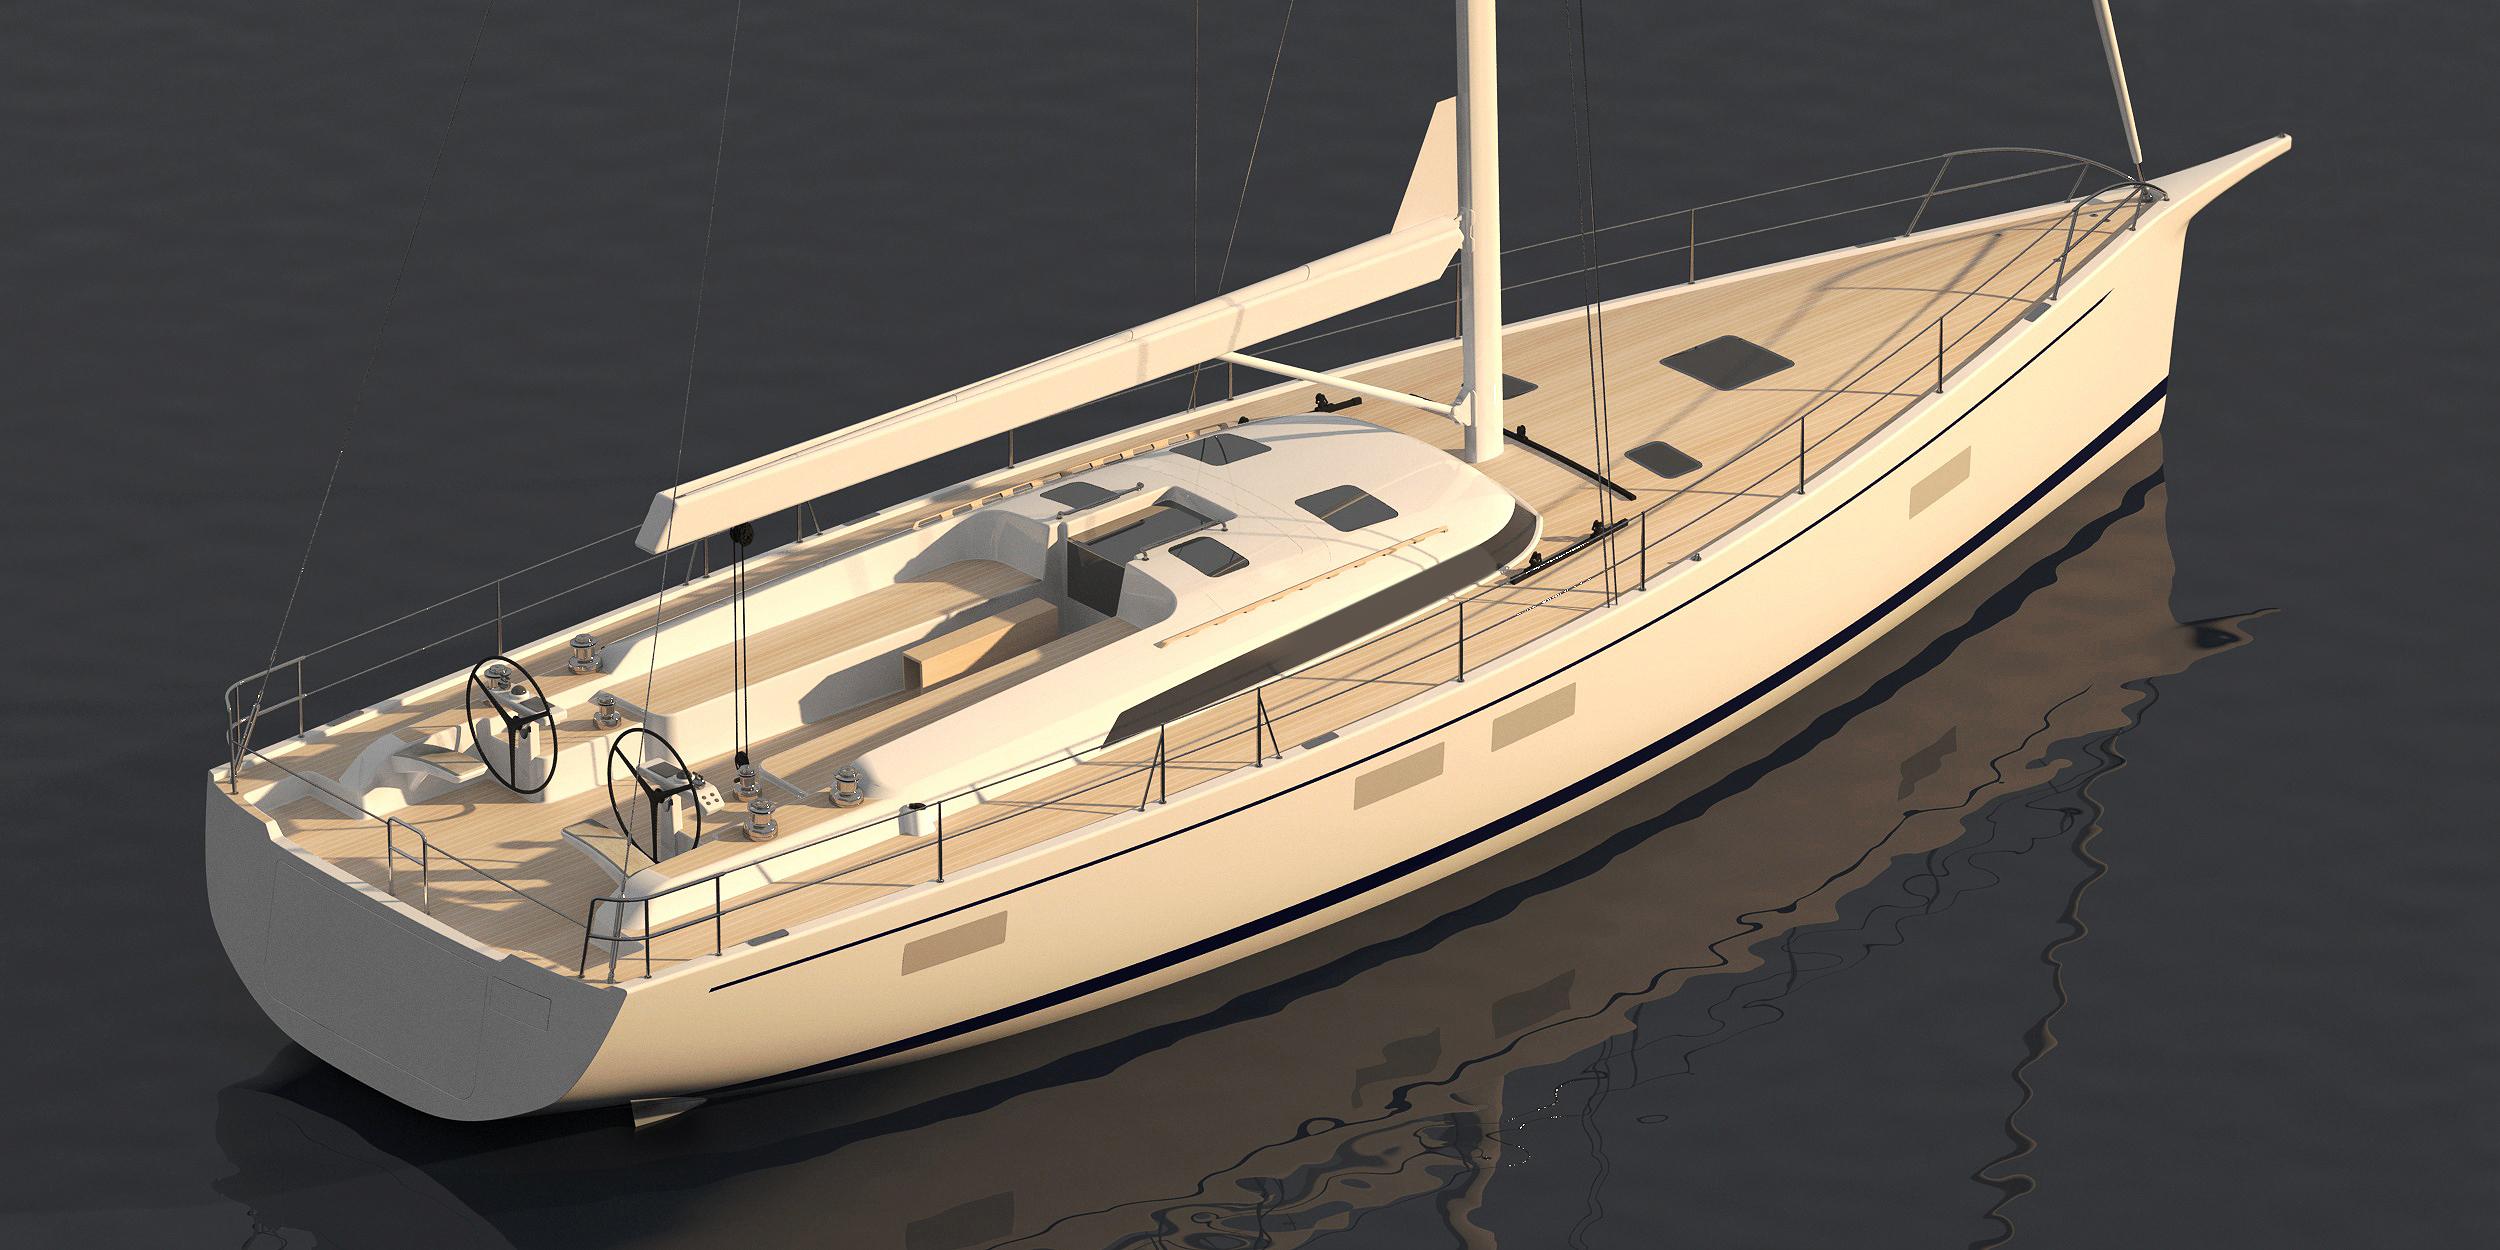 New Build Option Hylas 60 for sale with Grabau International 004.JPG